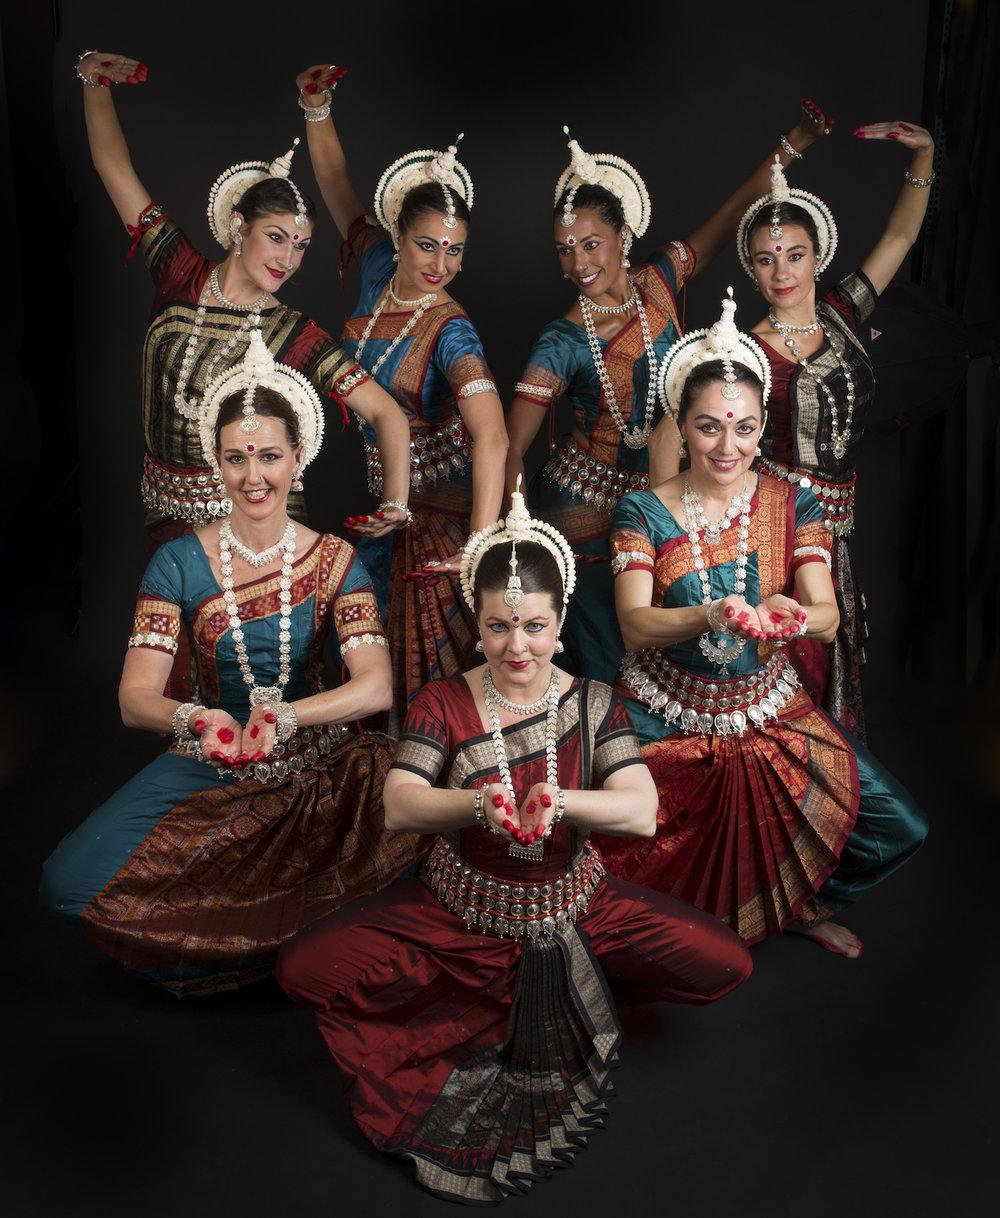 DancePhotos-ShaktiBhakti2016-DeviPridePhotography588.jpg